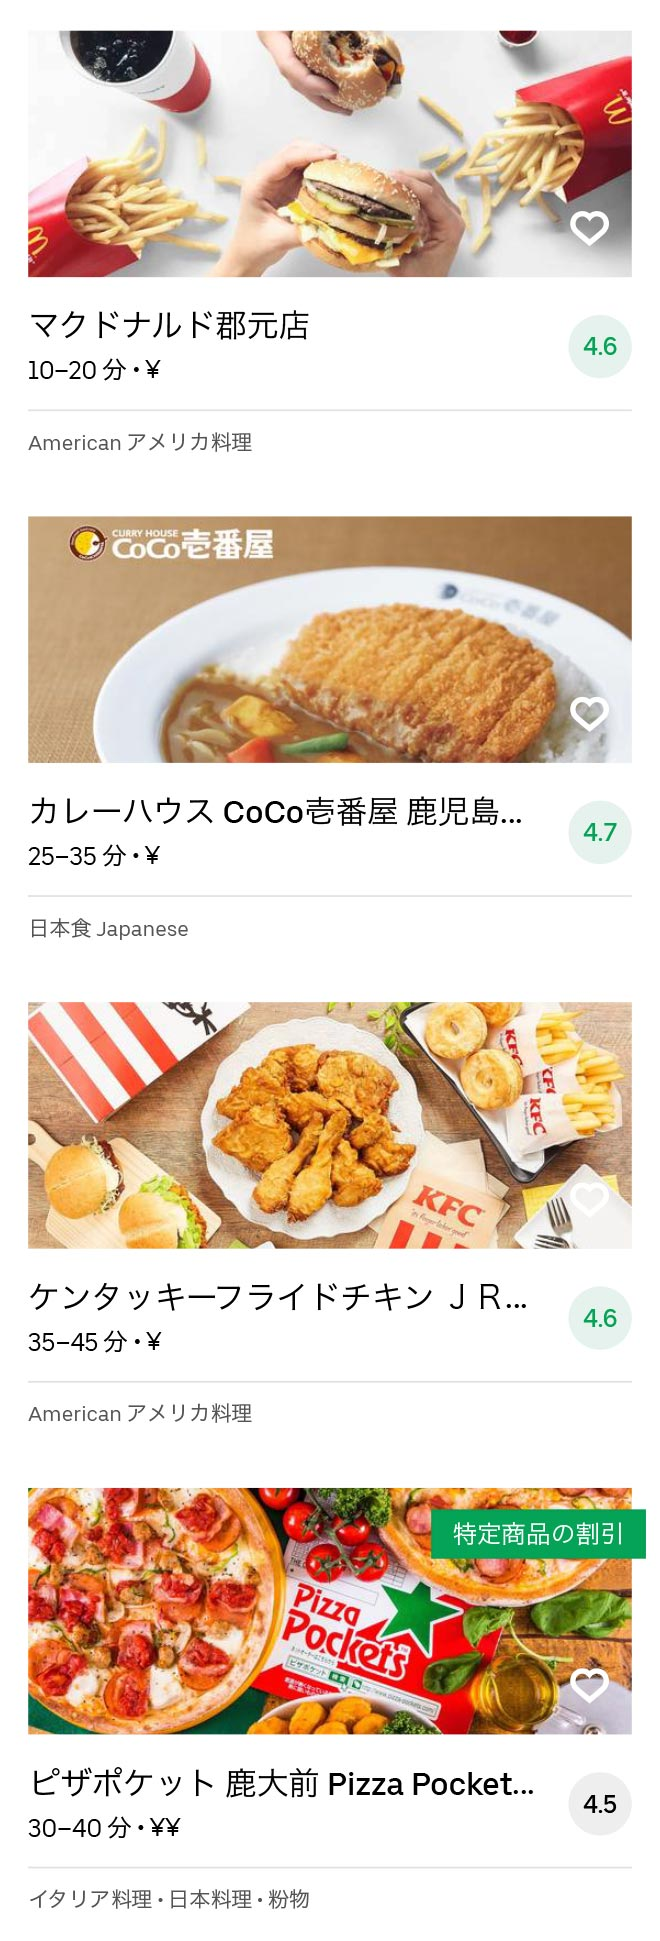 Korimoto menu 2009 5